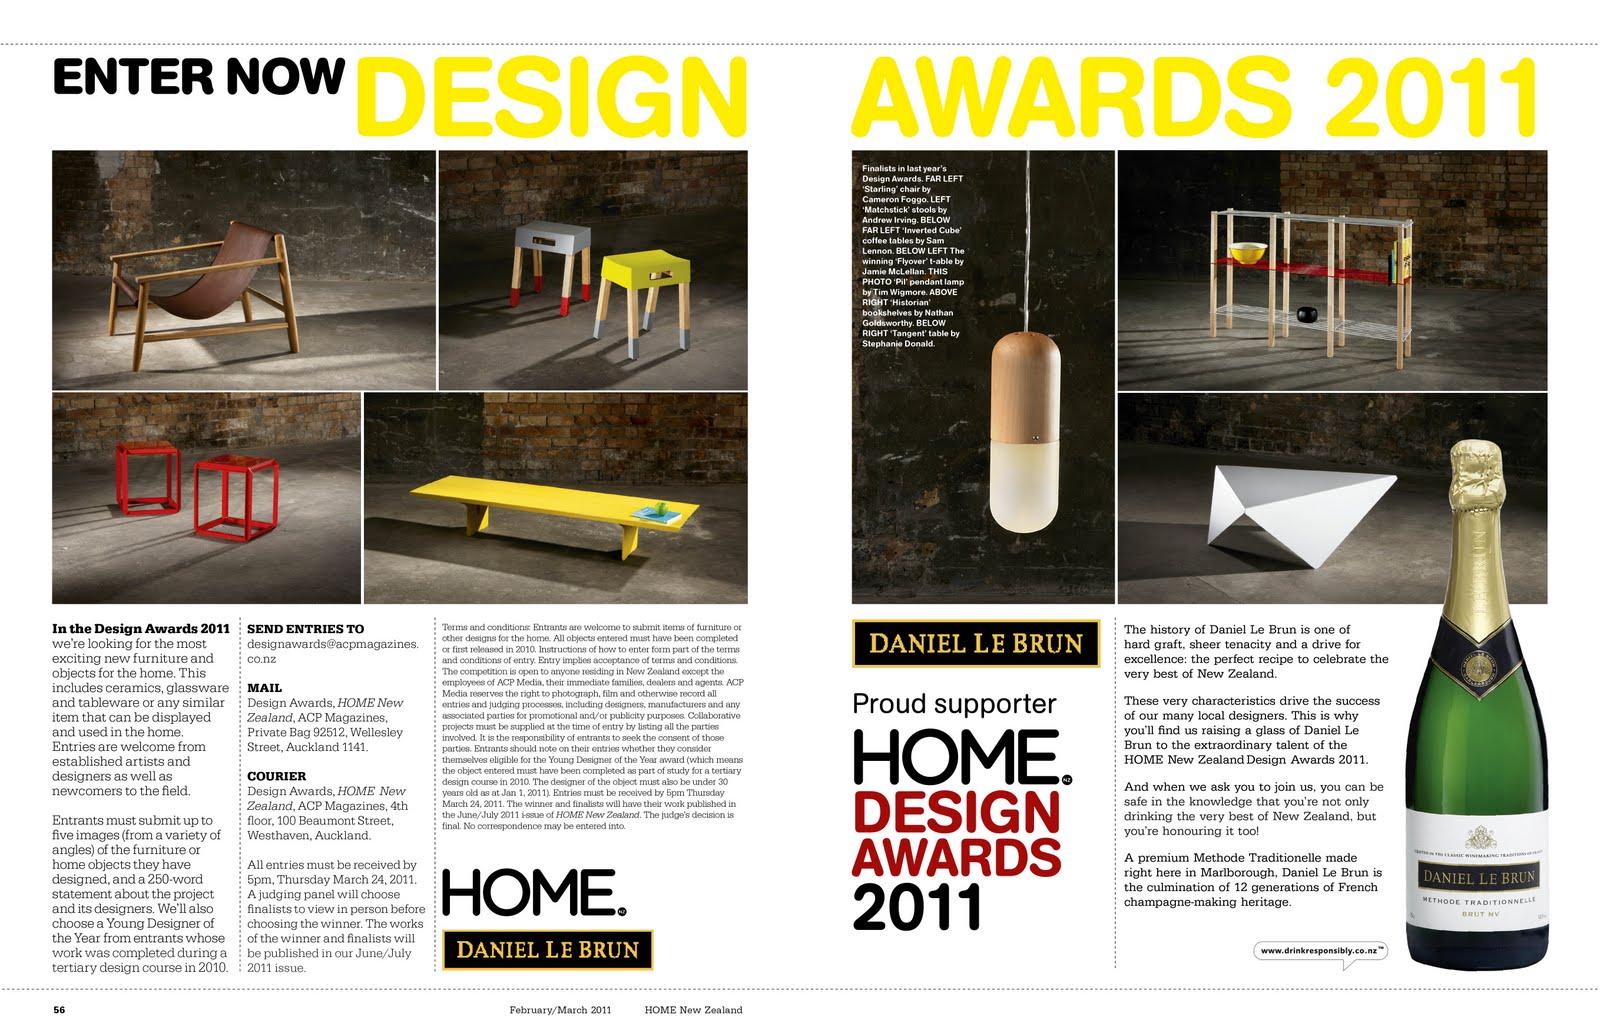 ART+OBJECT NEWS: Home Magazine Design Awards 2011 Function